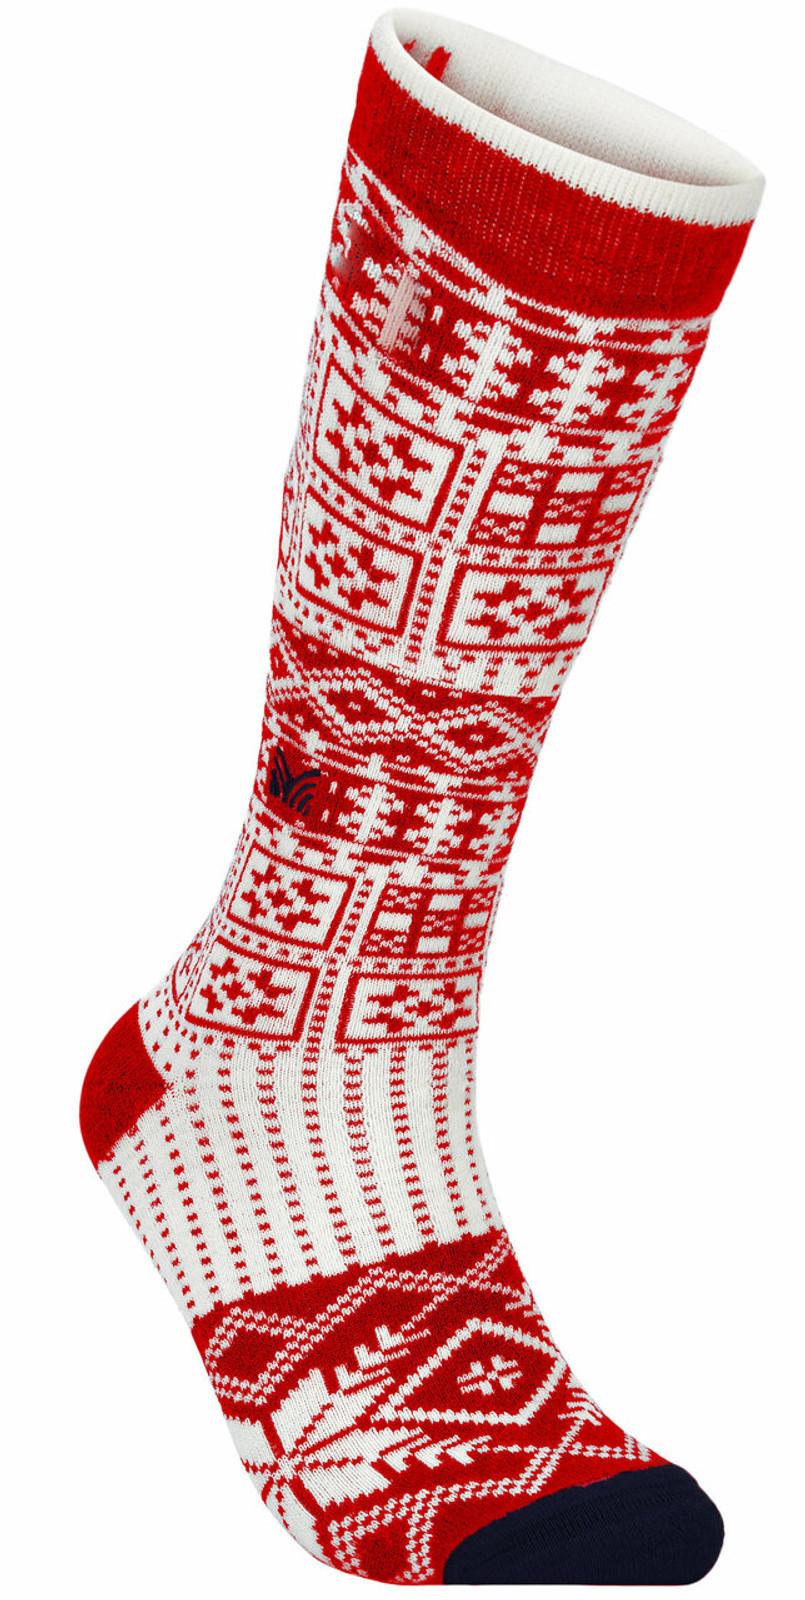 Dale of Norway OL History Sock High, Raspberry/Off White/Navy, 50151B